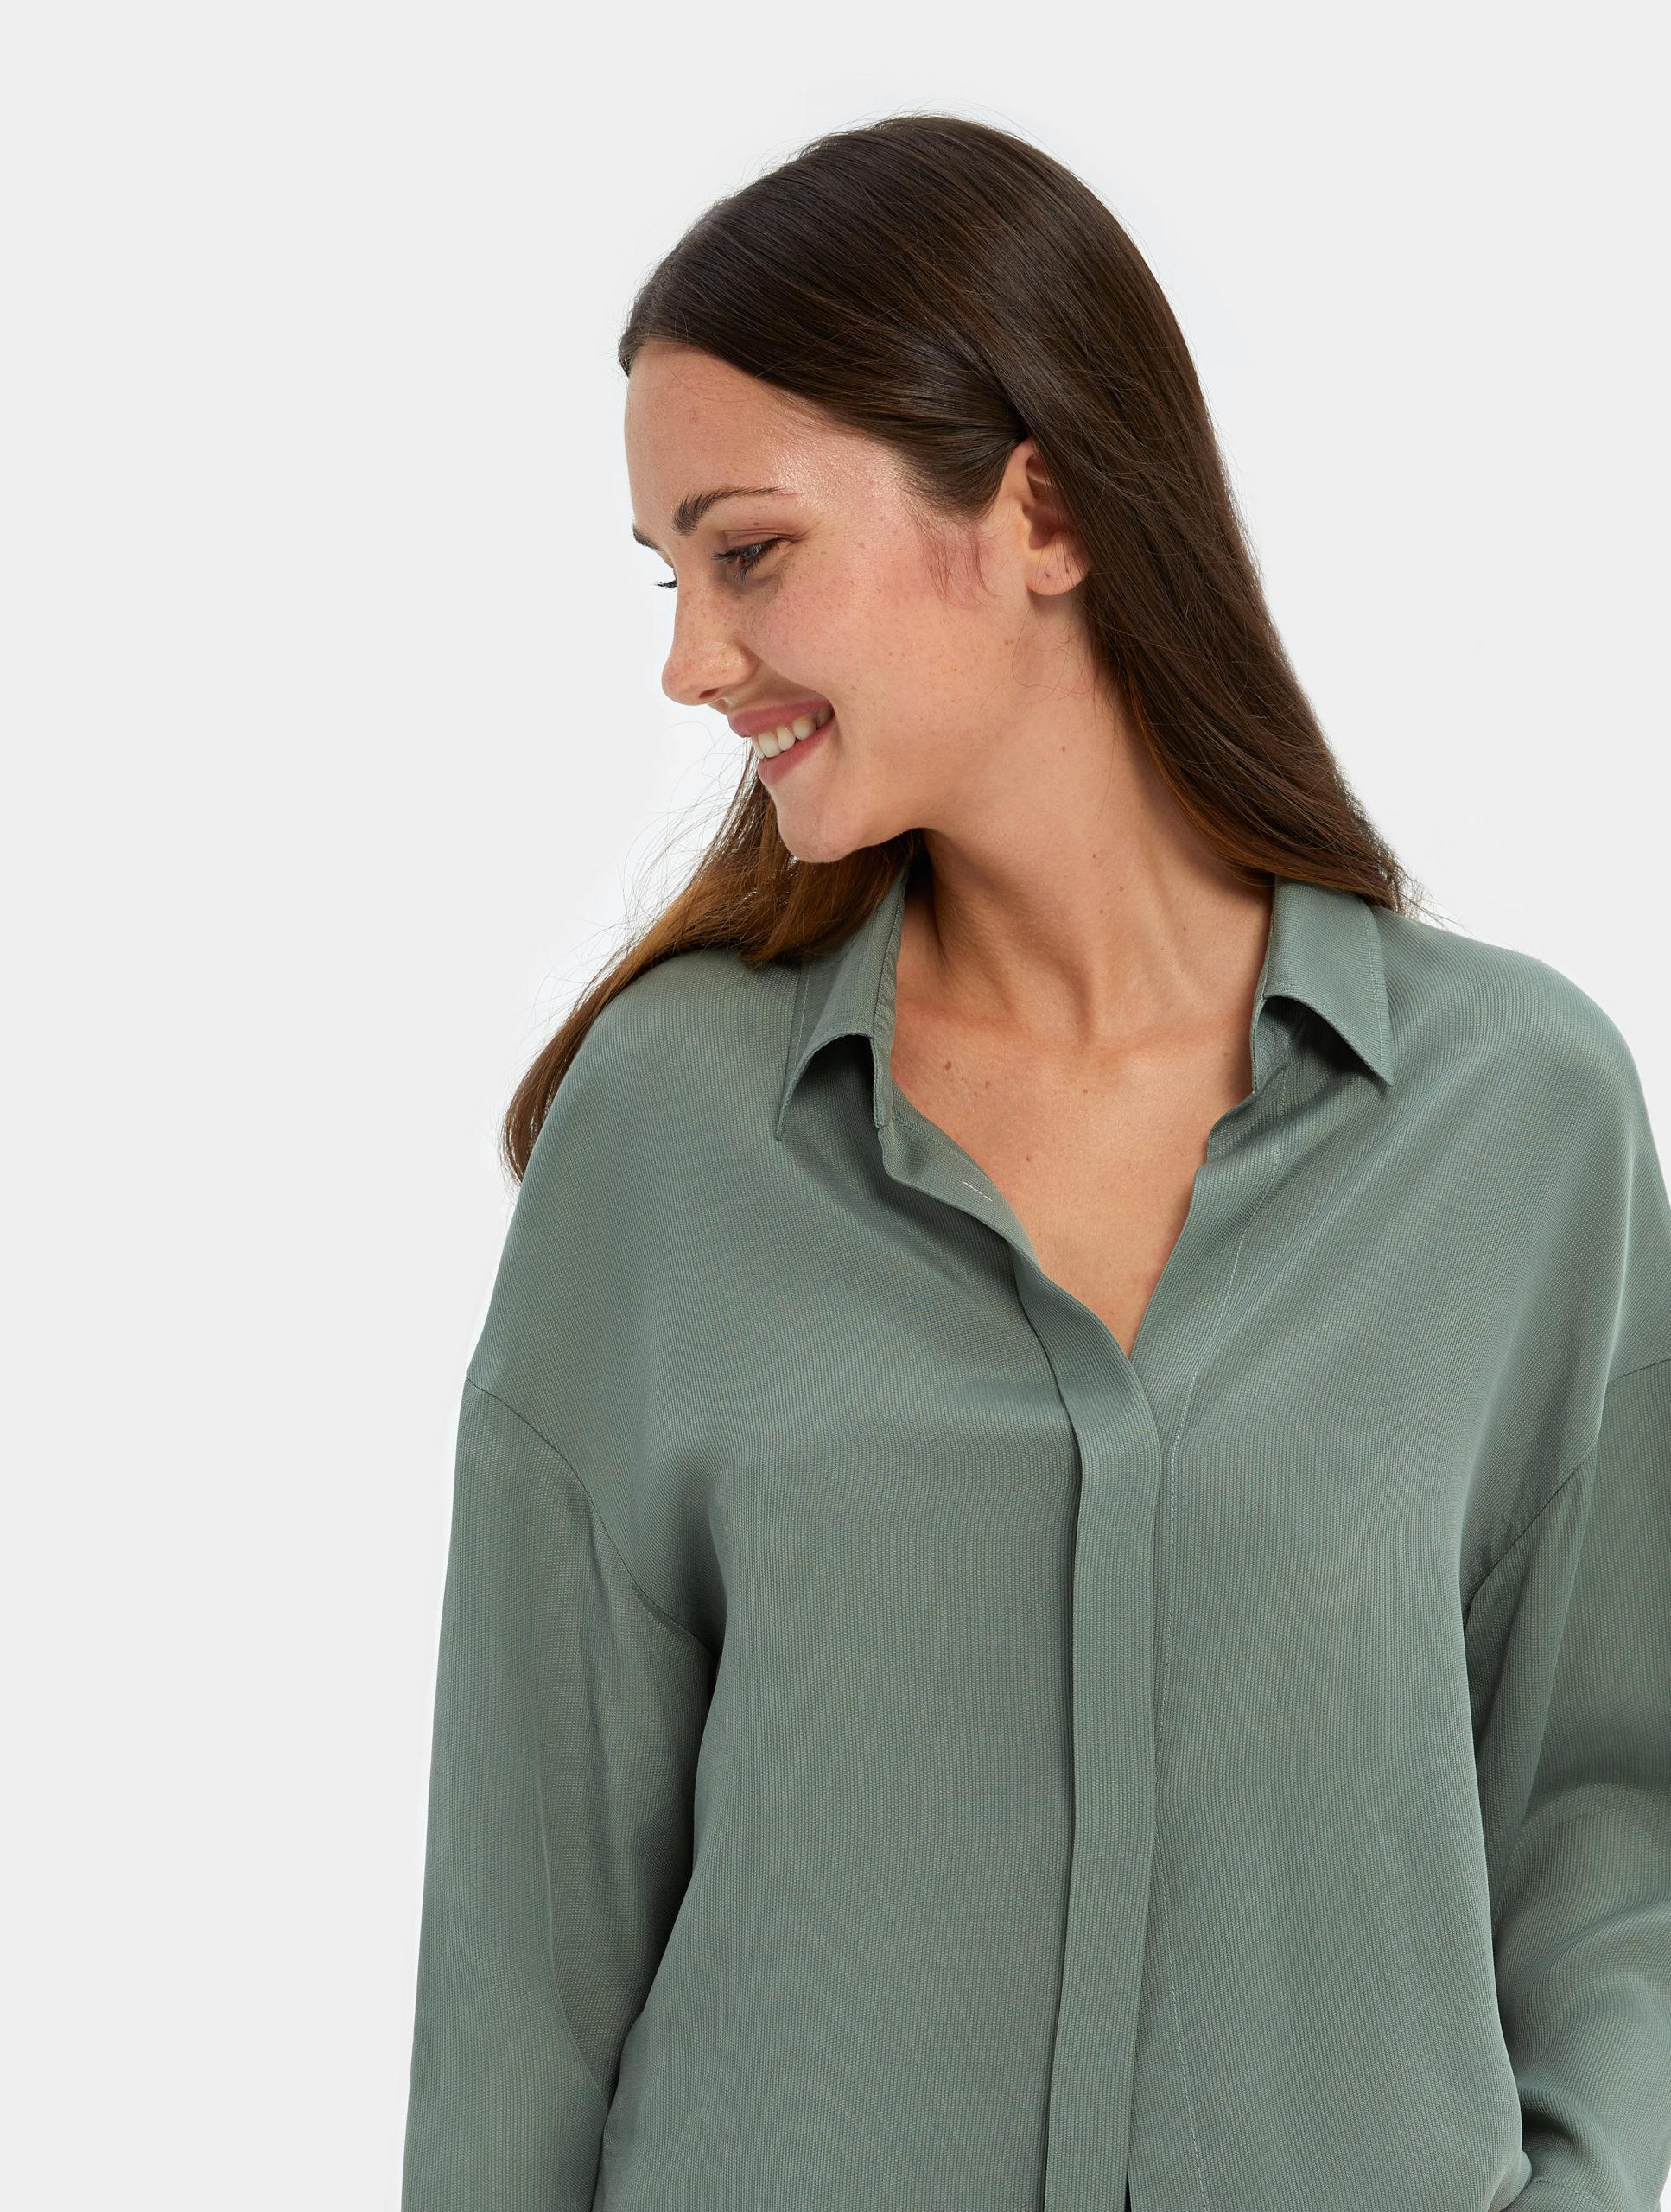 Best Women's Sleepwear - Turn Down Collar Shirt   Nap Sleepwear